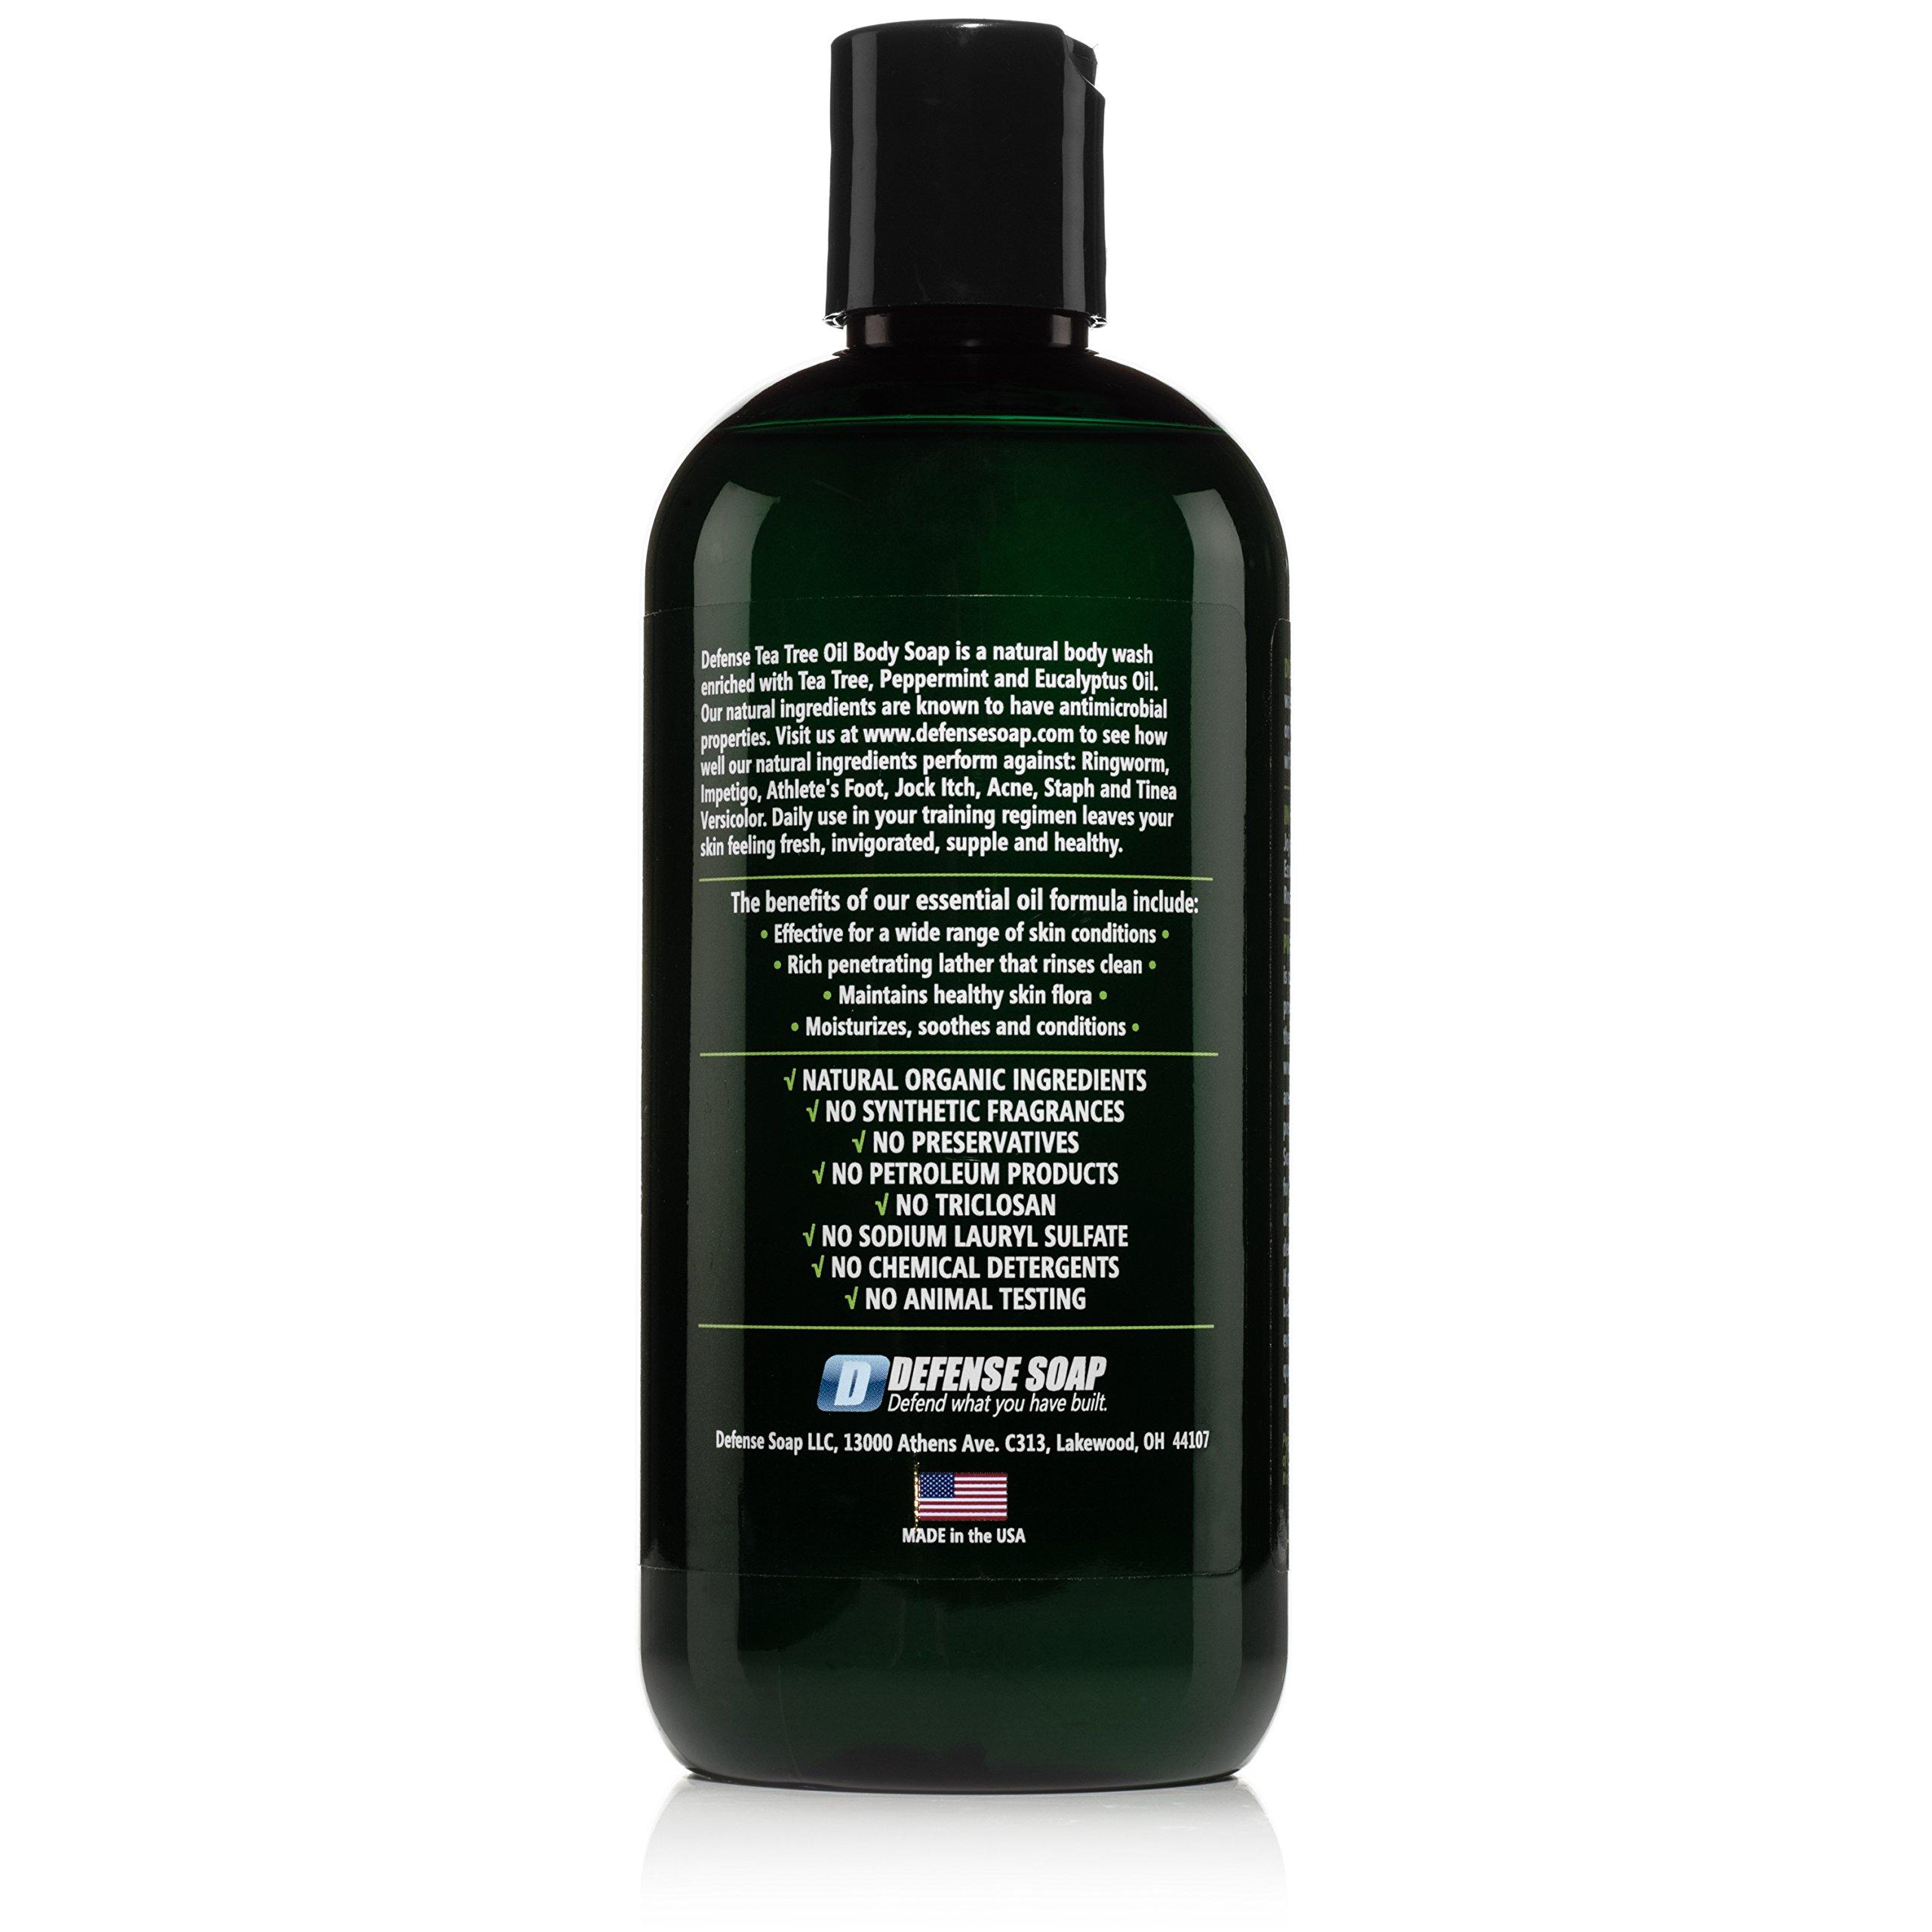 Defense Soap Peppermint Body Wash Shower Gel 12 Oz - Natural Tea Tree Eucalyptus Peppermint Oil (Pack of 2)